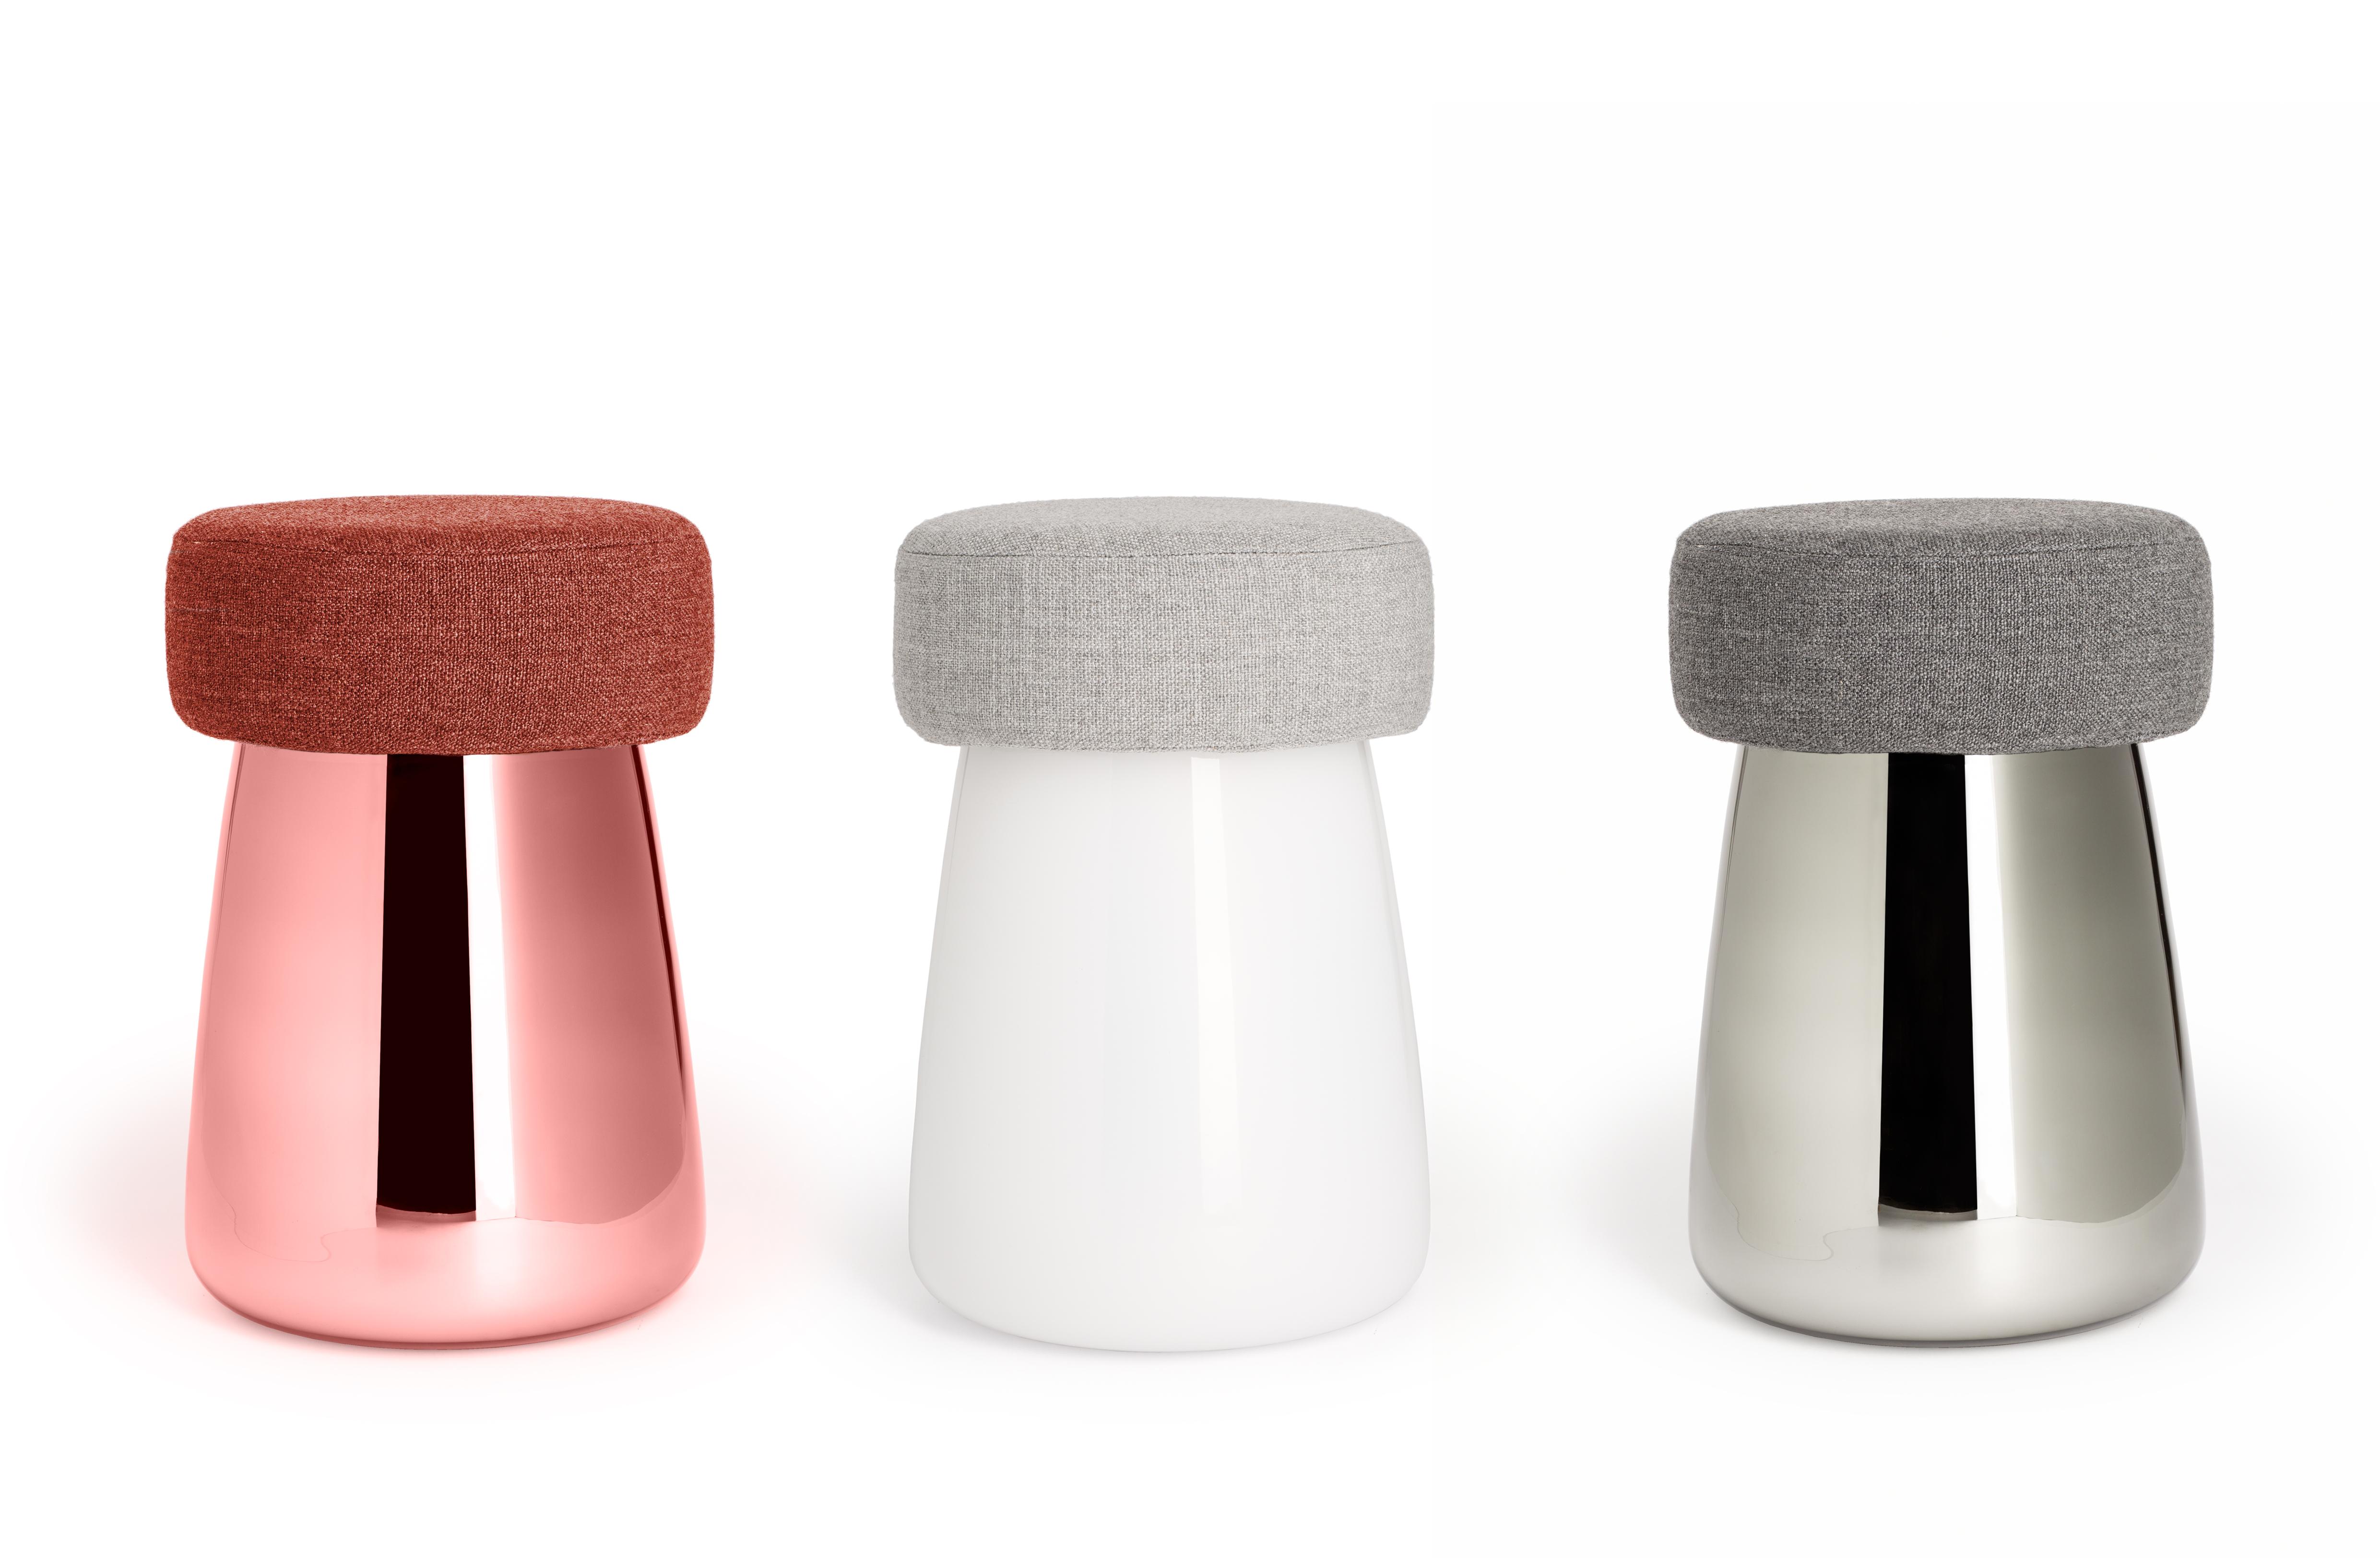 verreum_chubby-stool_design-alain-gilles_05